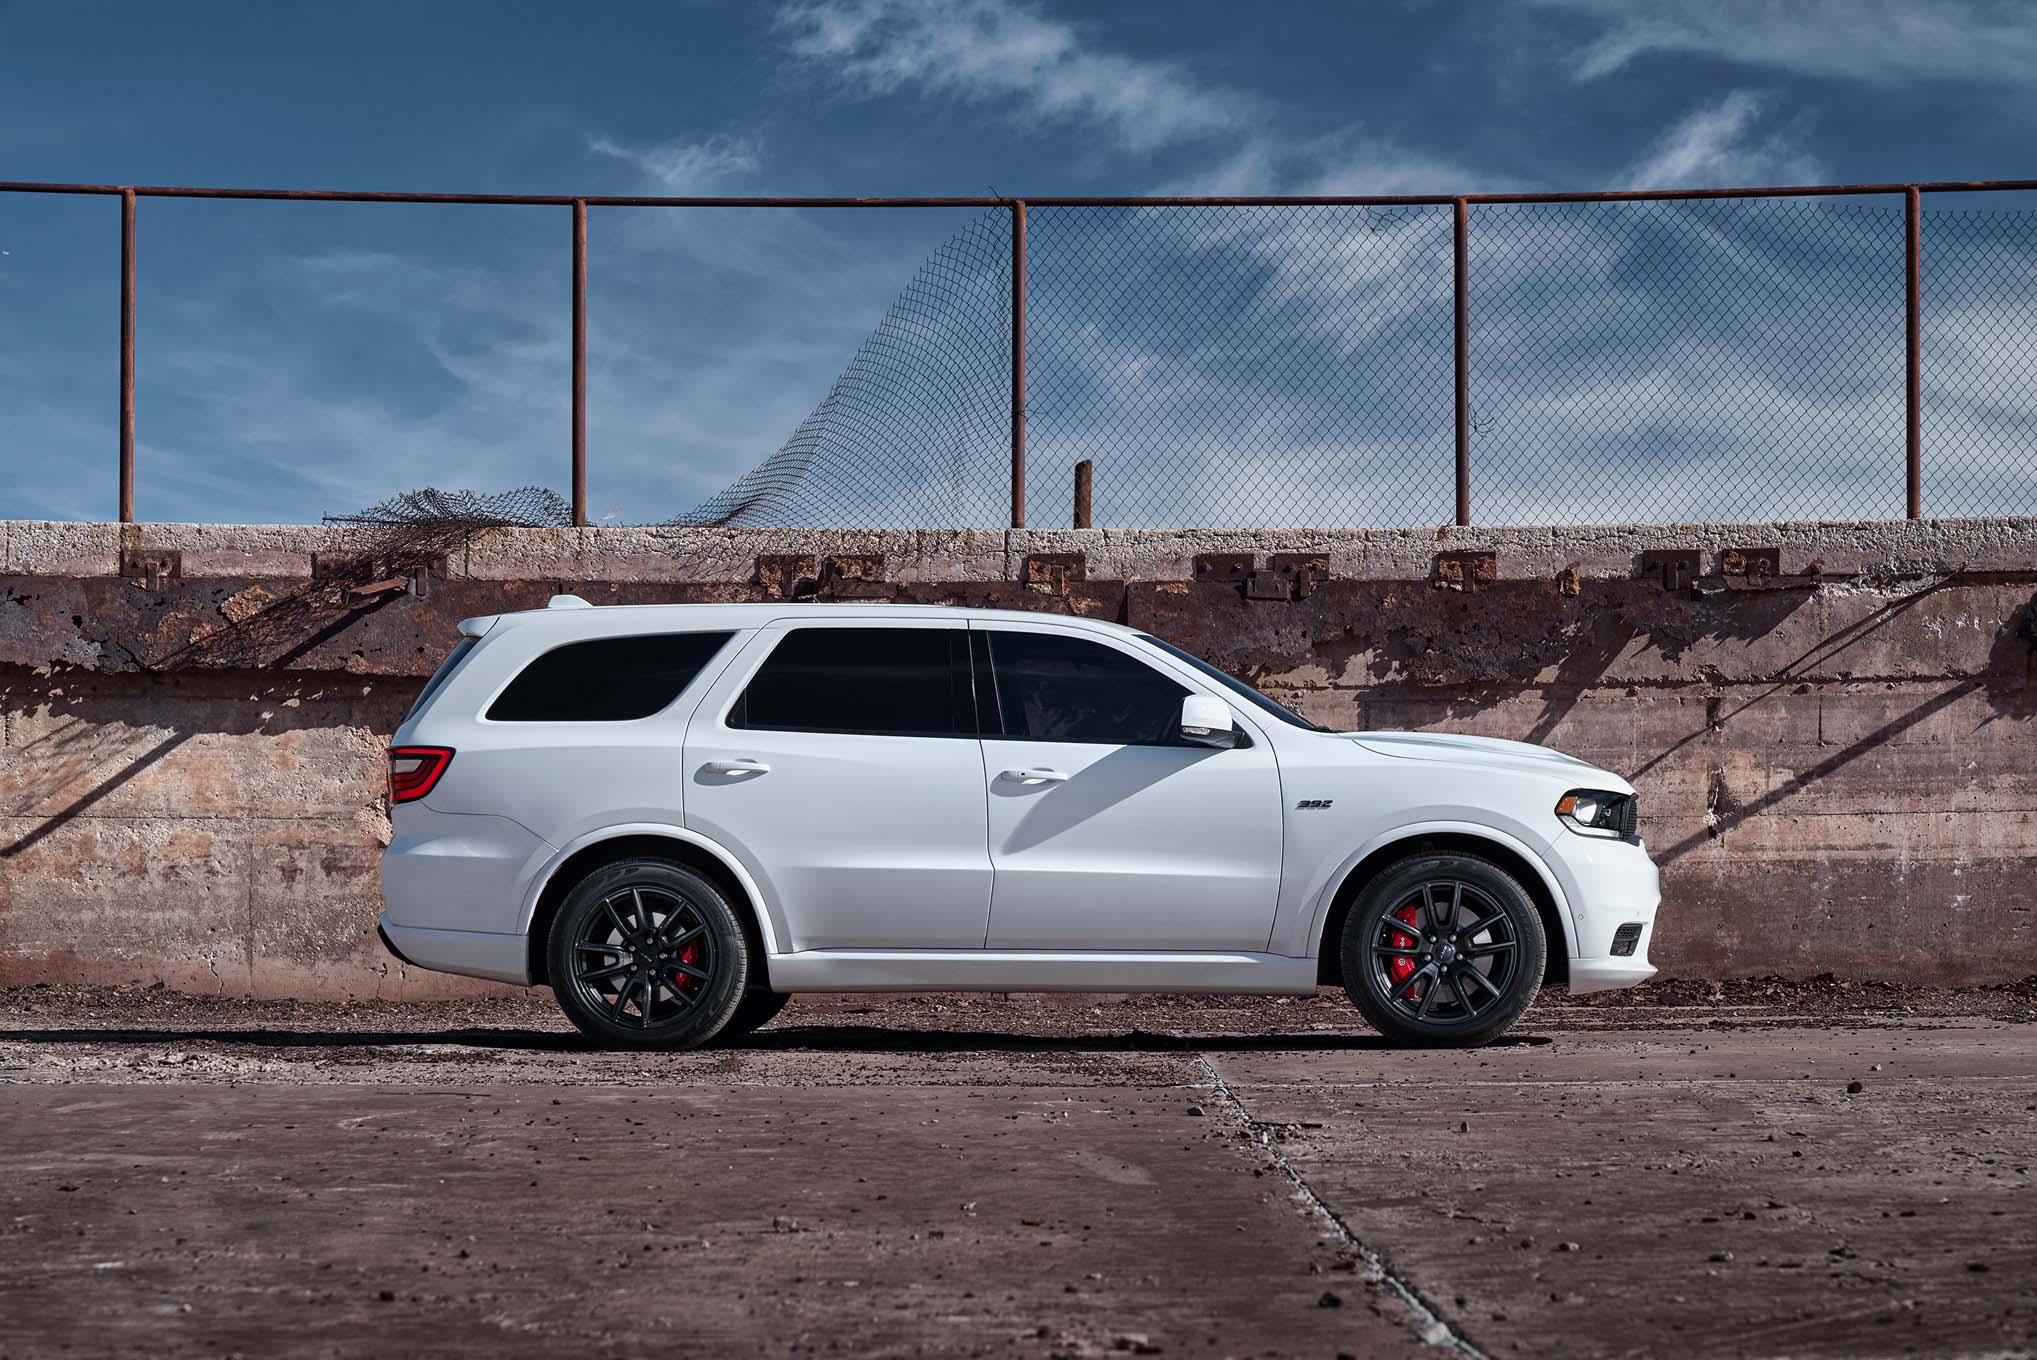 2018 Dodge Durango Srt First Look Automobile Magazine